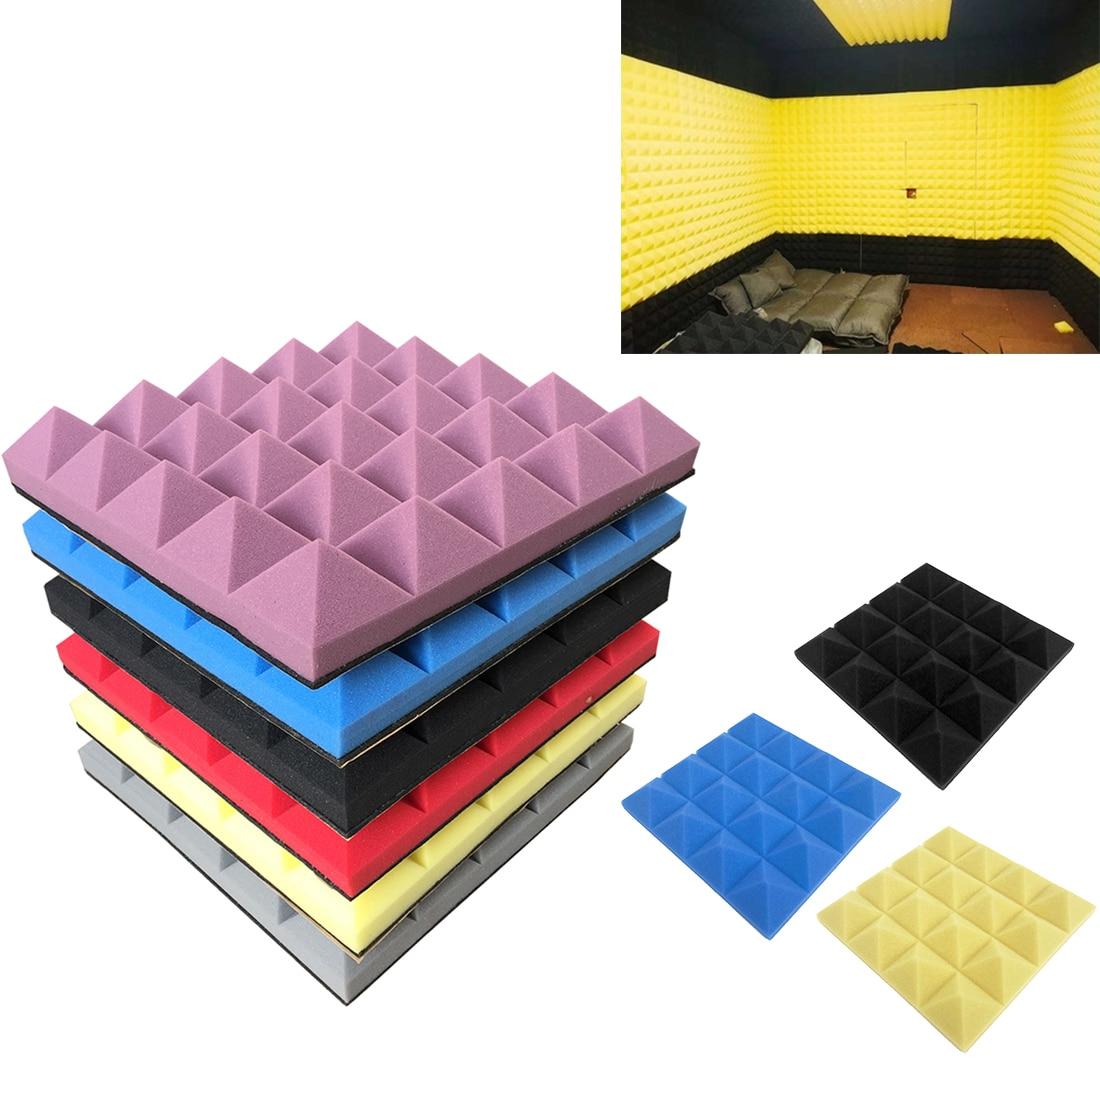 Colorful Soundproofing Foam Studio Acoustic Foam Soundproof Absorption Treatment Panel Tile Wedge Polyurethane Foam 25x25CM